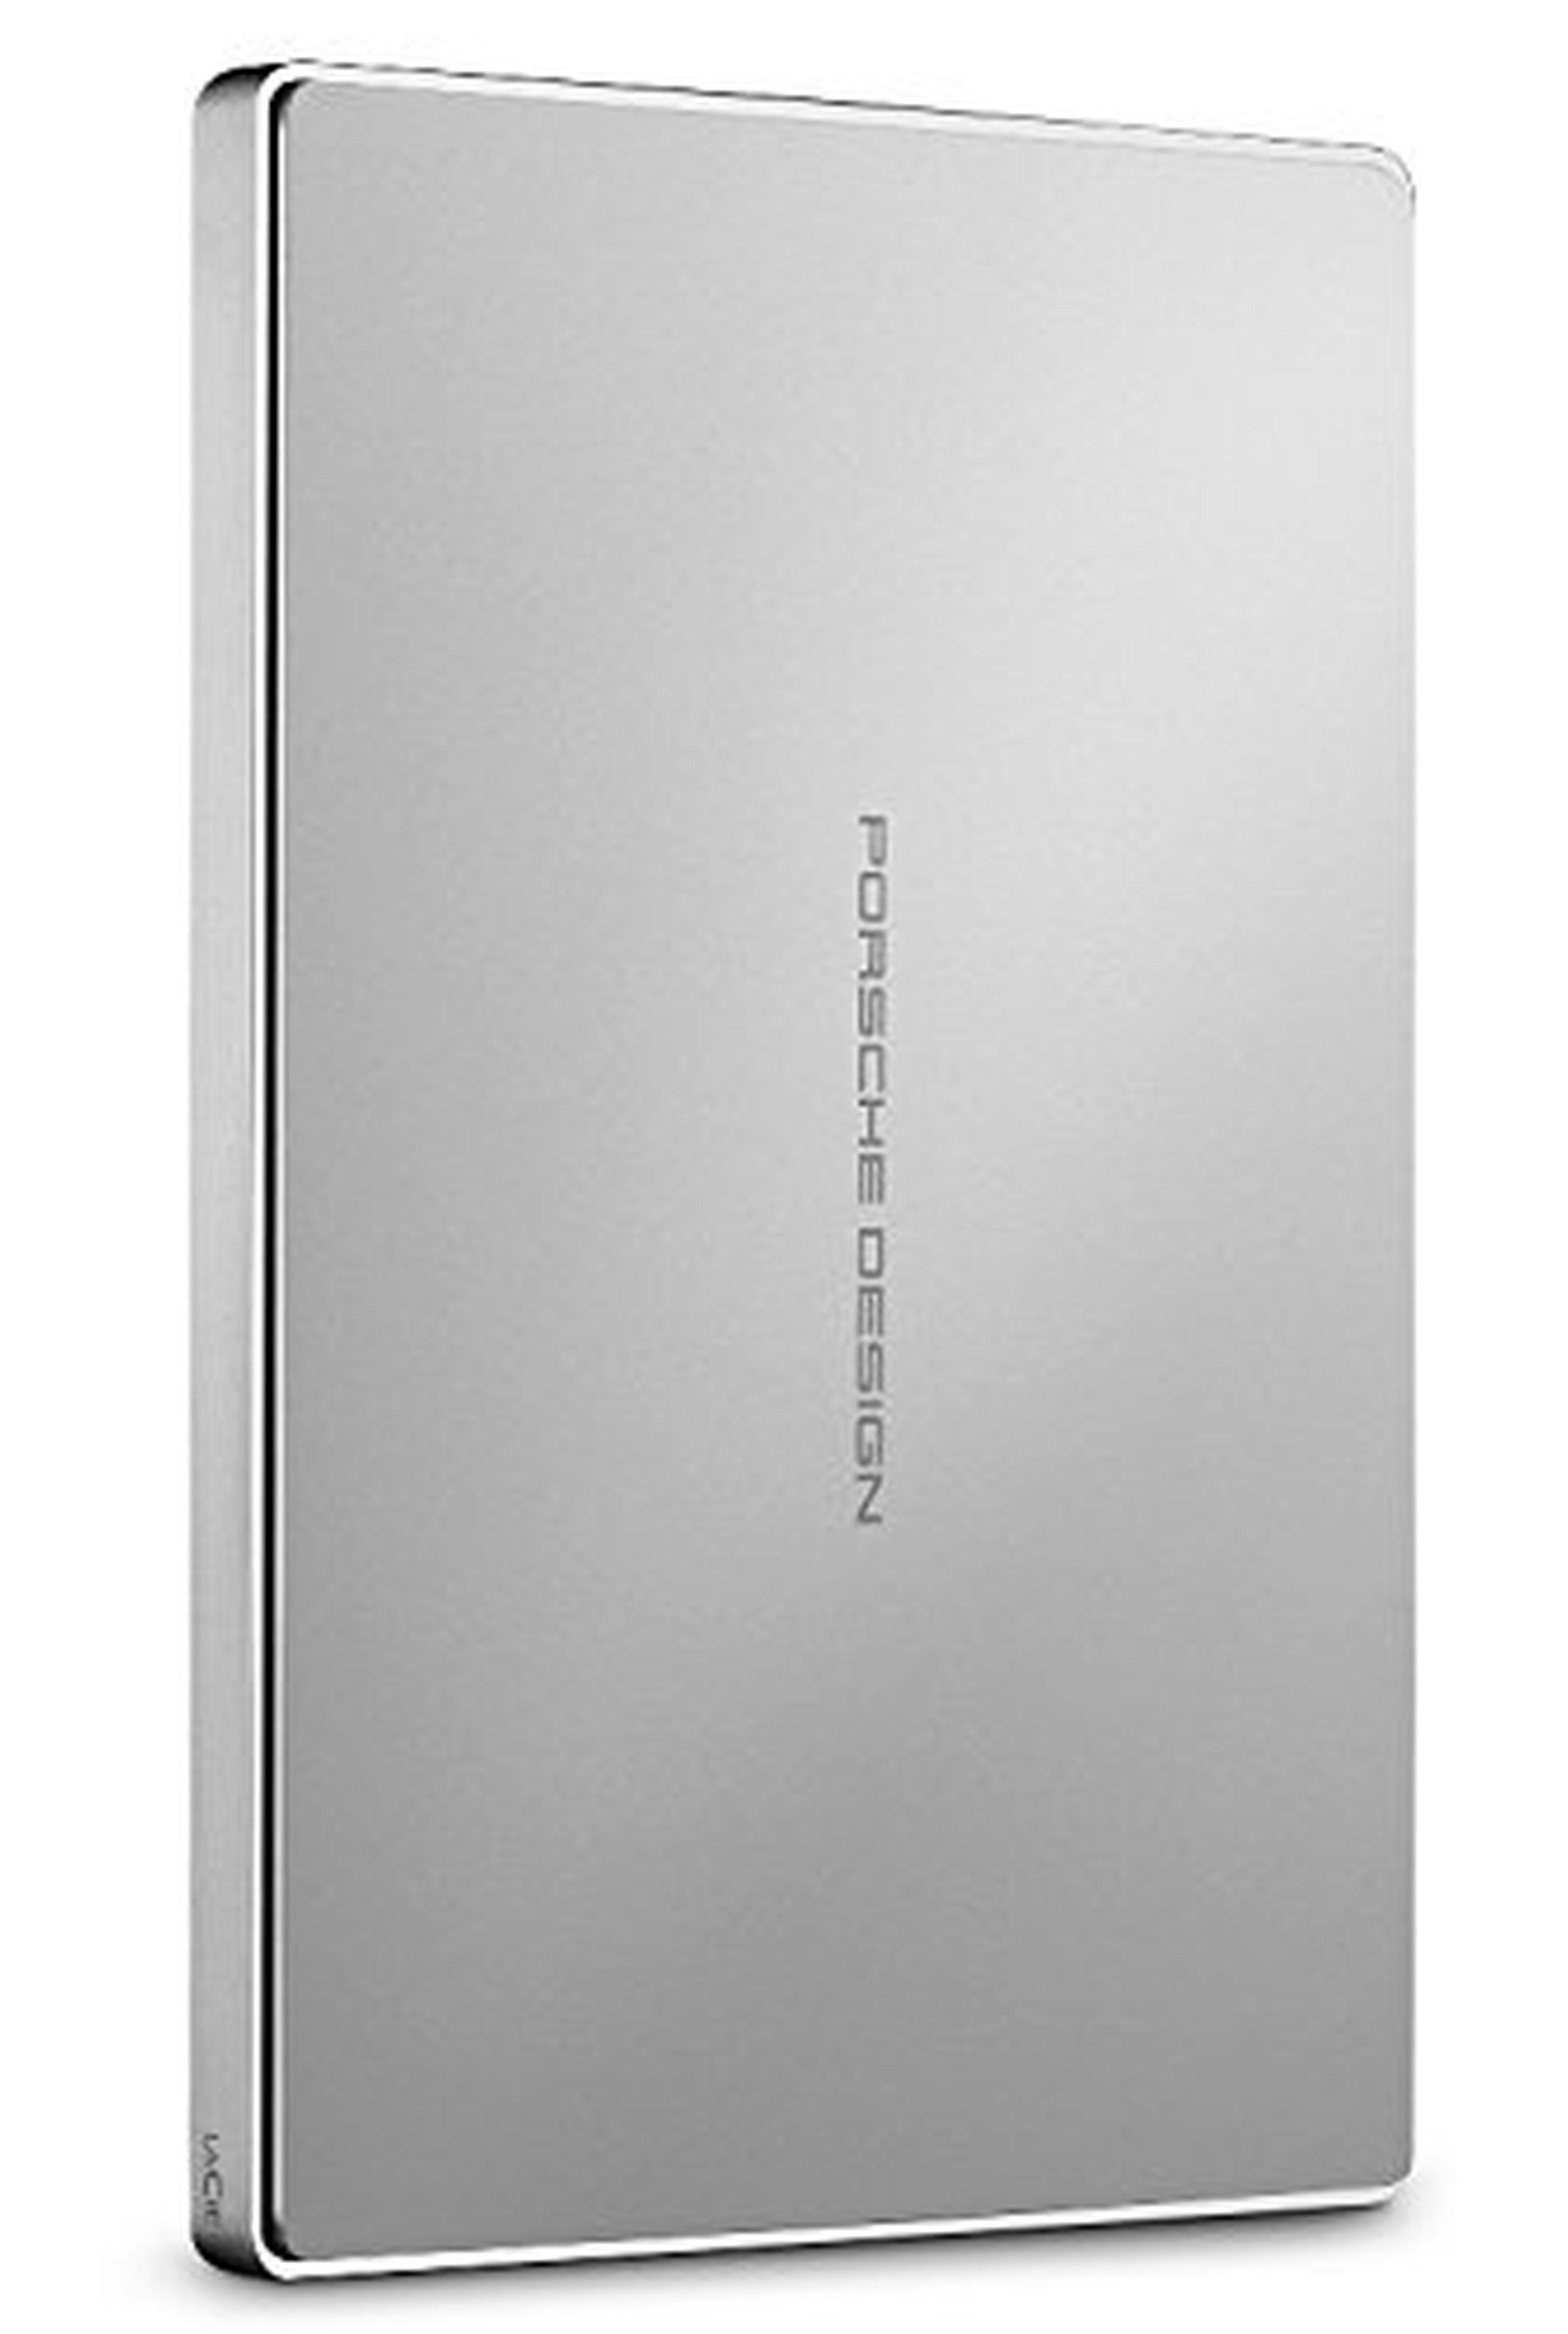 LACIE Porsche Design externe Festplatte »STFD1000400 1 TB«